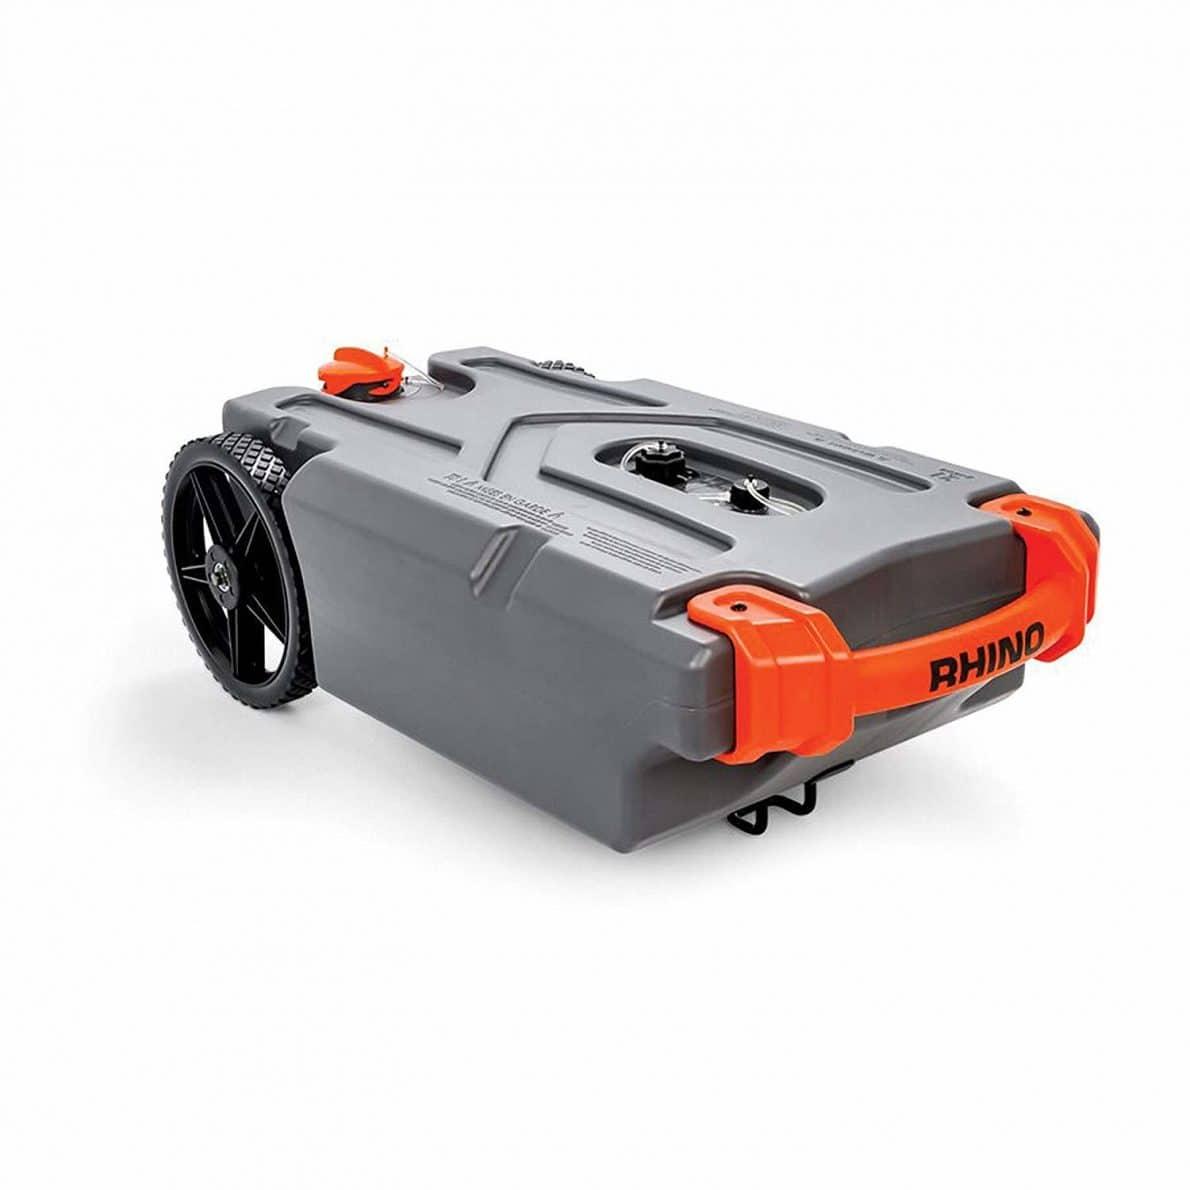 Camco Rhino Heavy Duty 21 Gallon Portable Waste Holding Hose